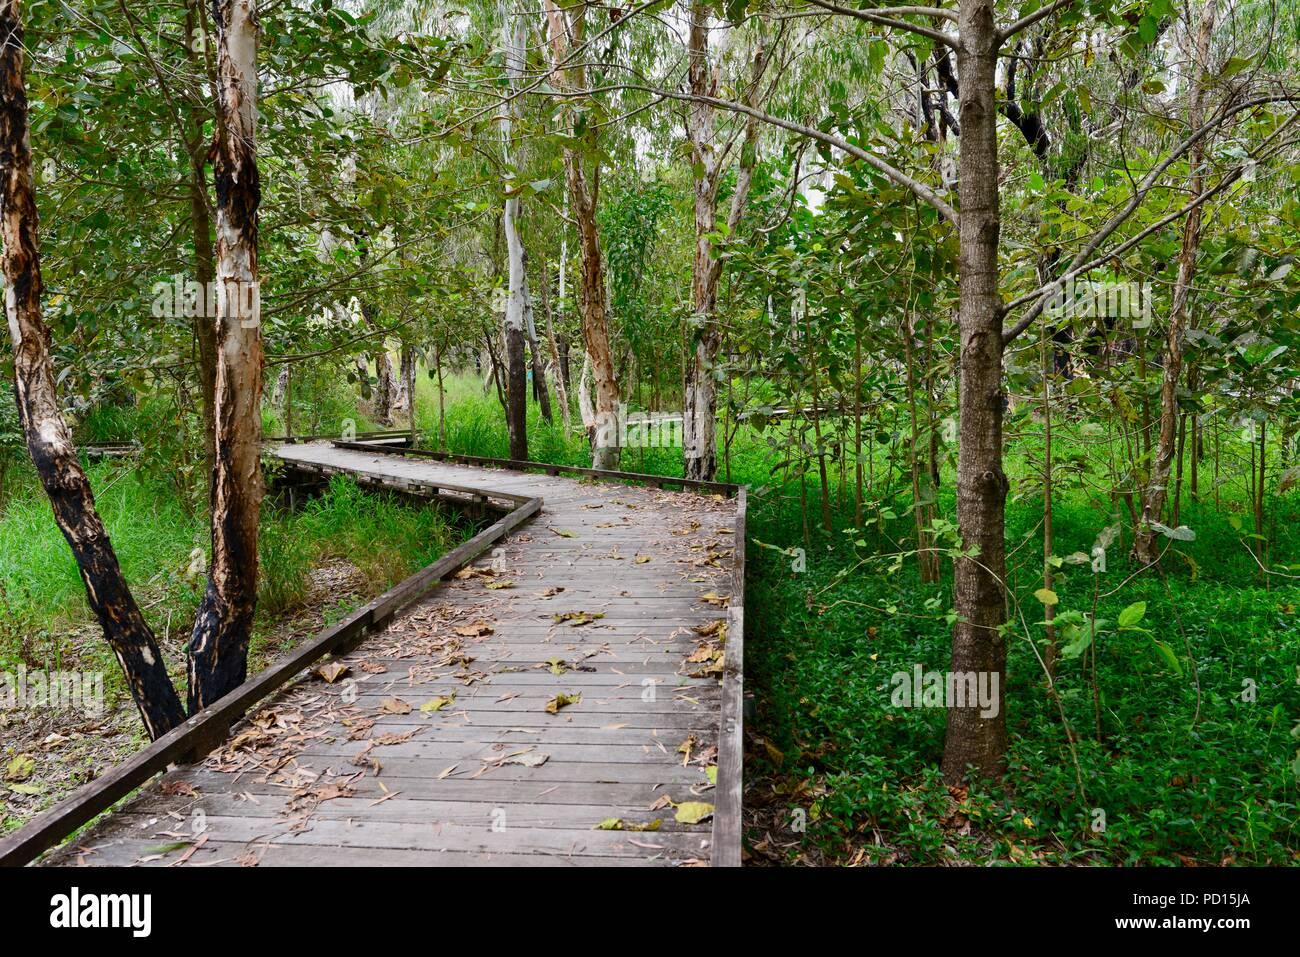 Boardwalk at Booroona walking trail on the Ross River, Rasmussen QLD 4815, Australia Stock Photo